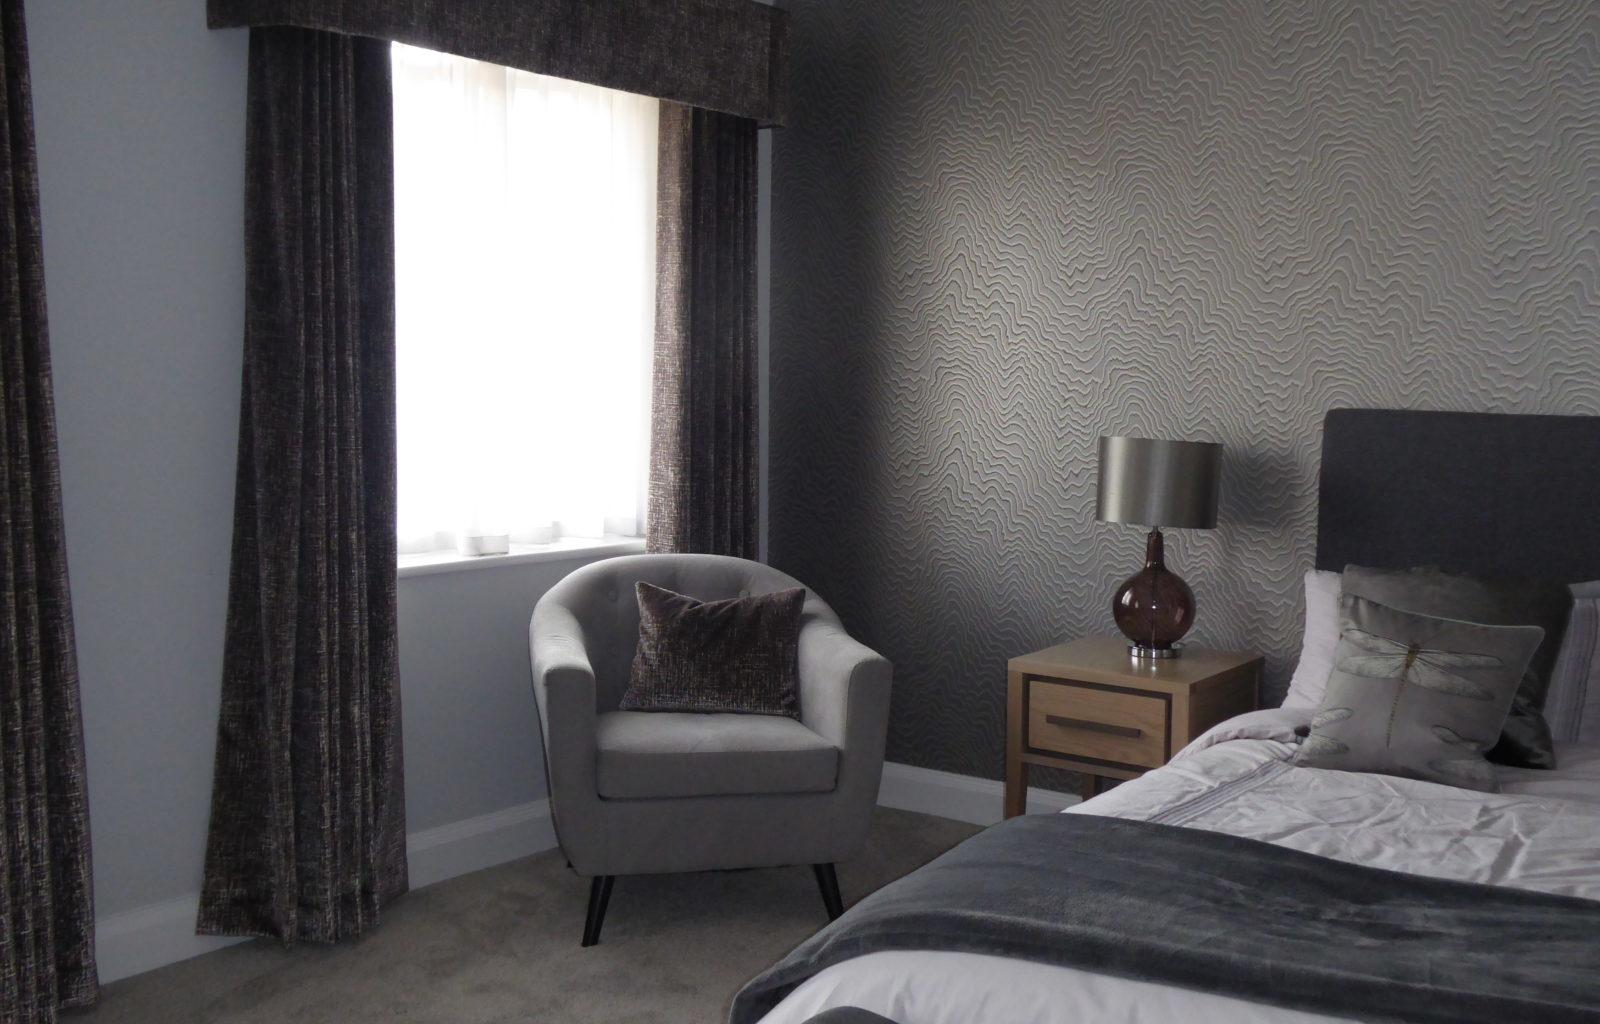 Soft Furnishings, Elegance, Flatbourd Pelmet, wave curtains